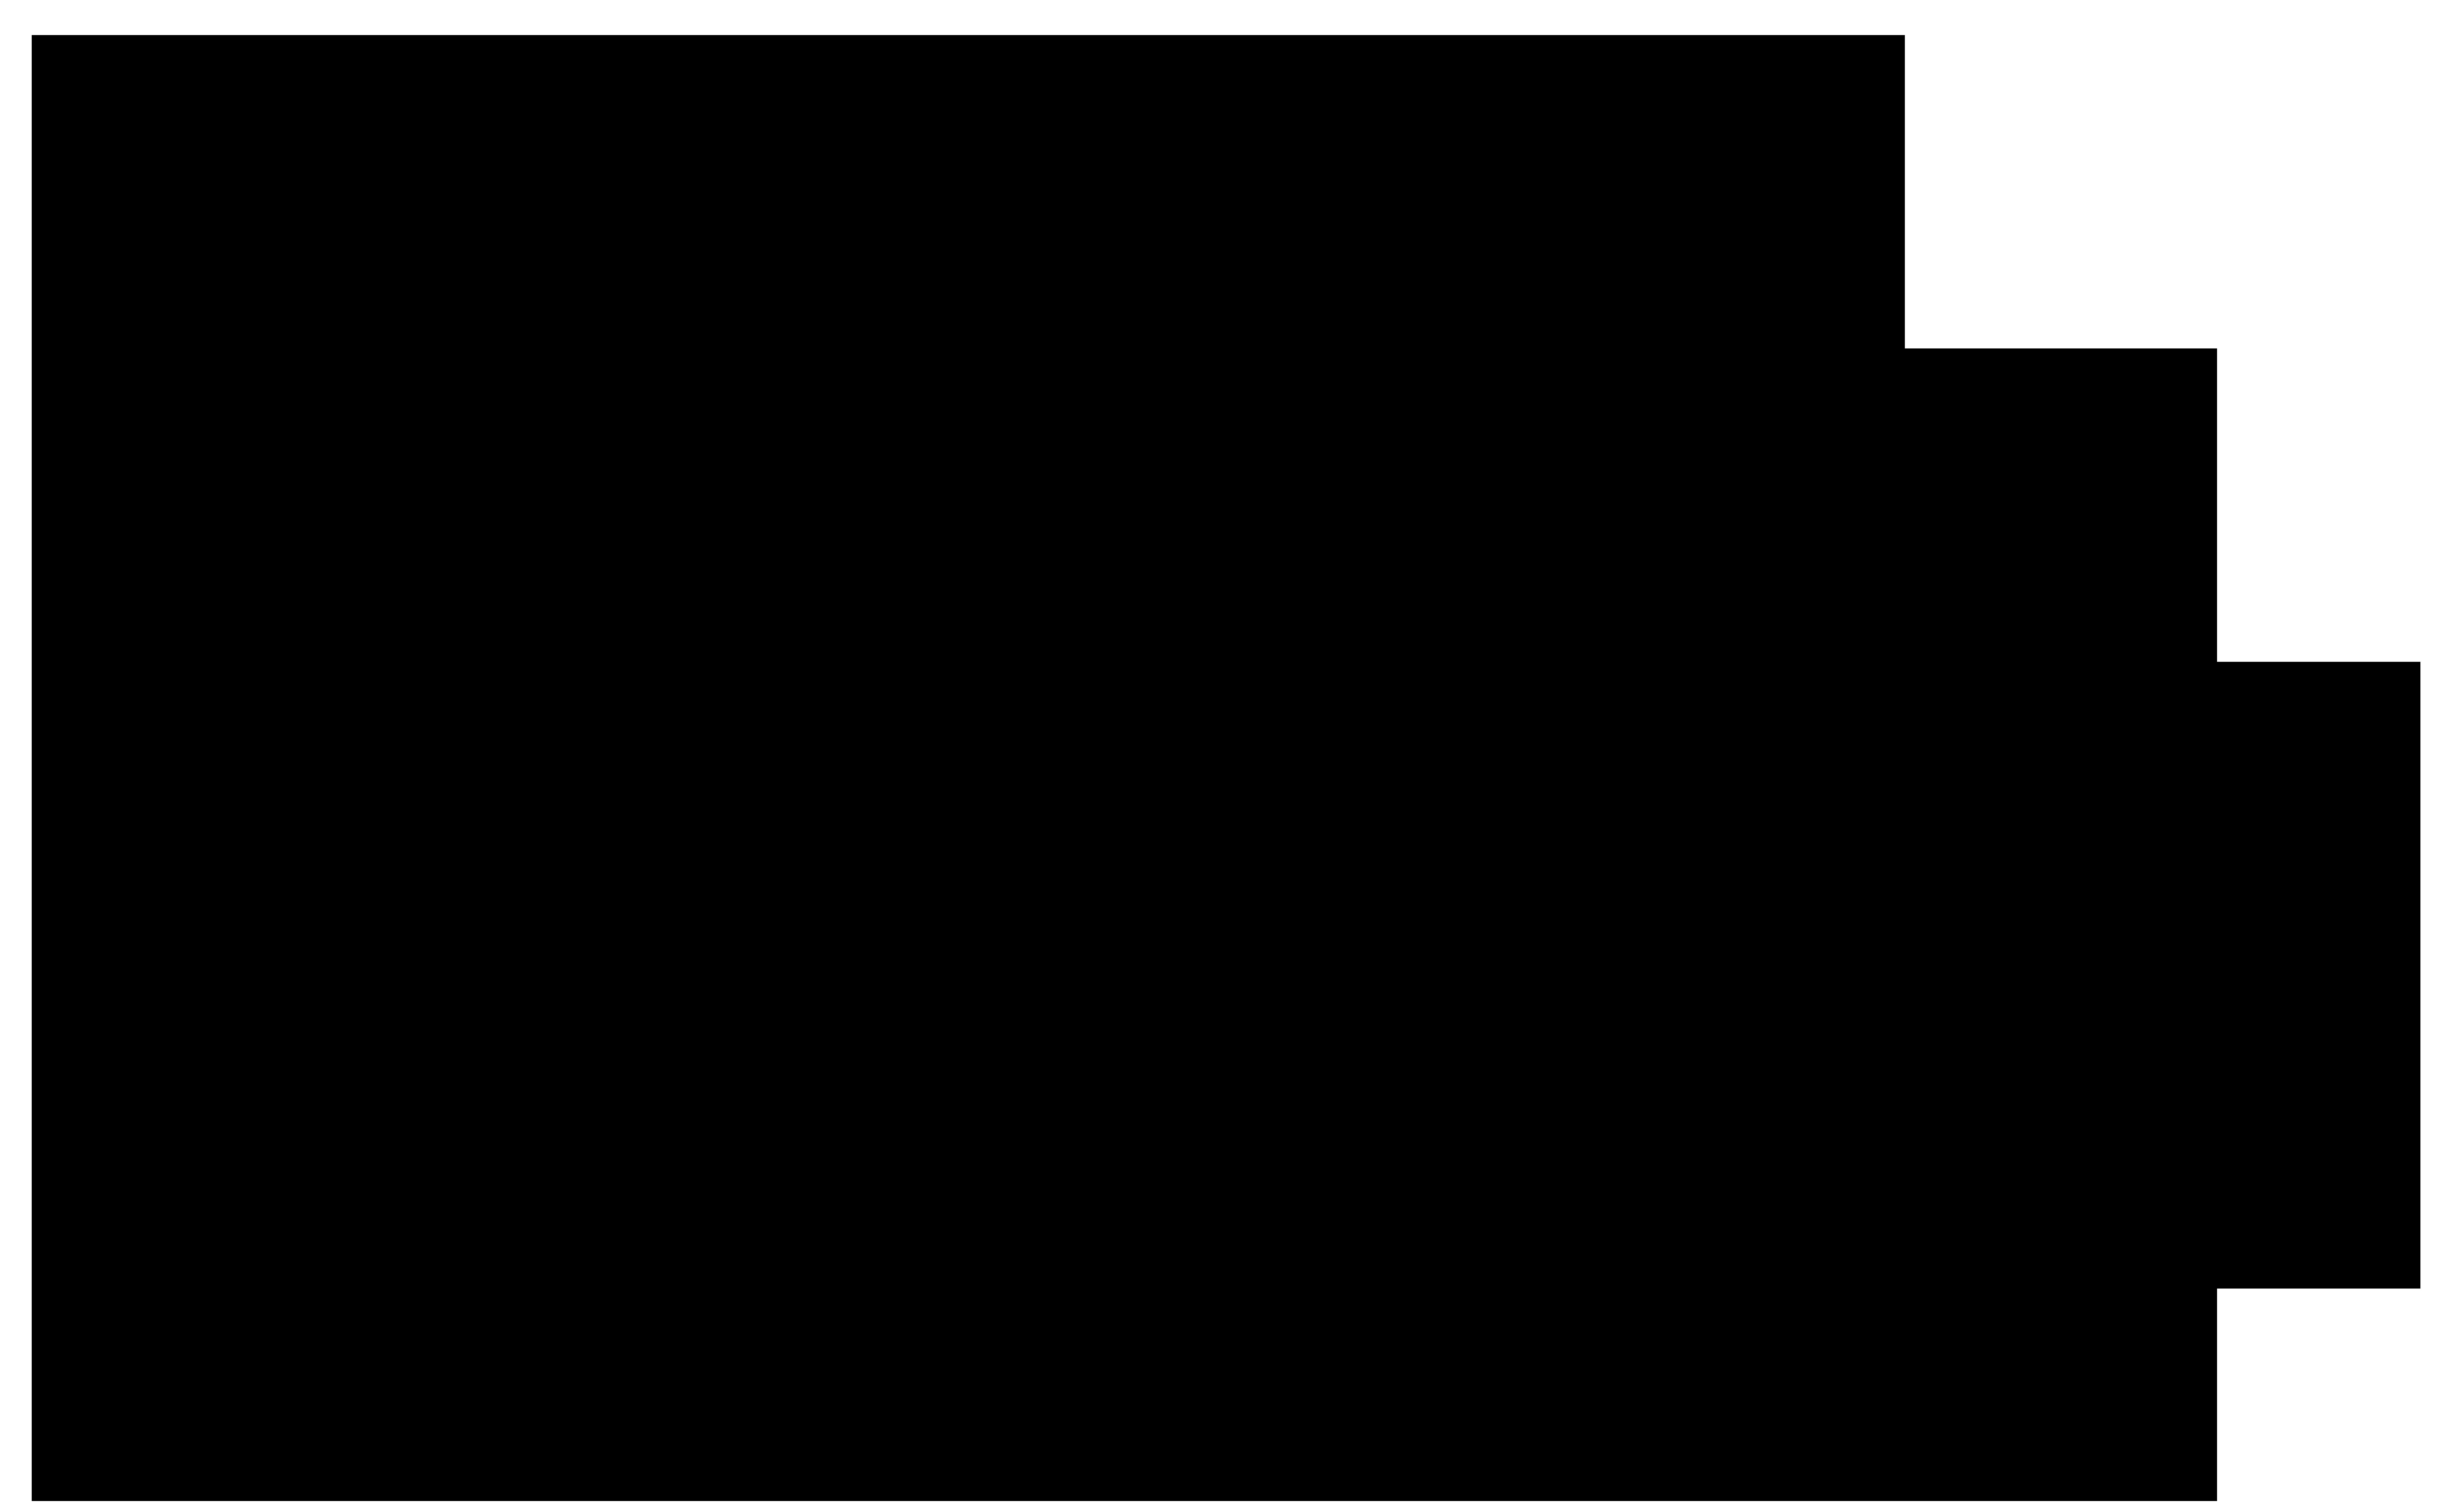 8000x4960 Clipart Free Lion Silhouette